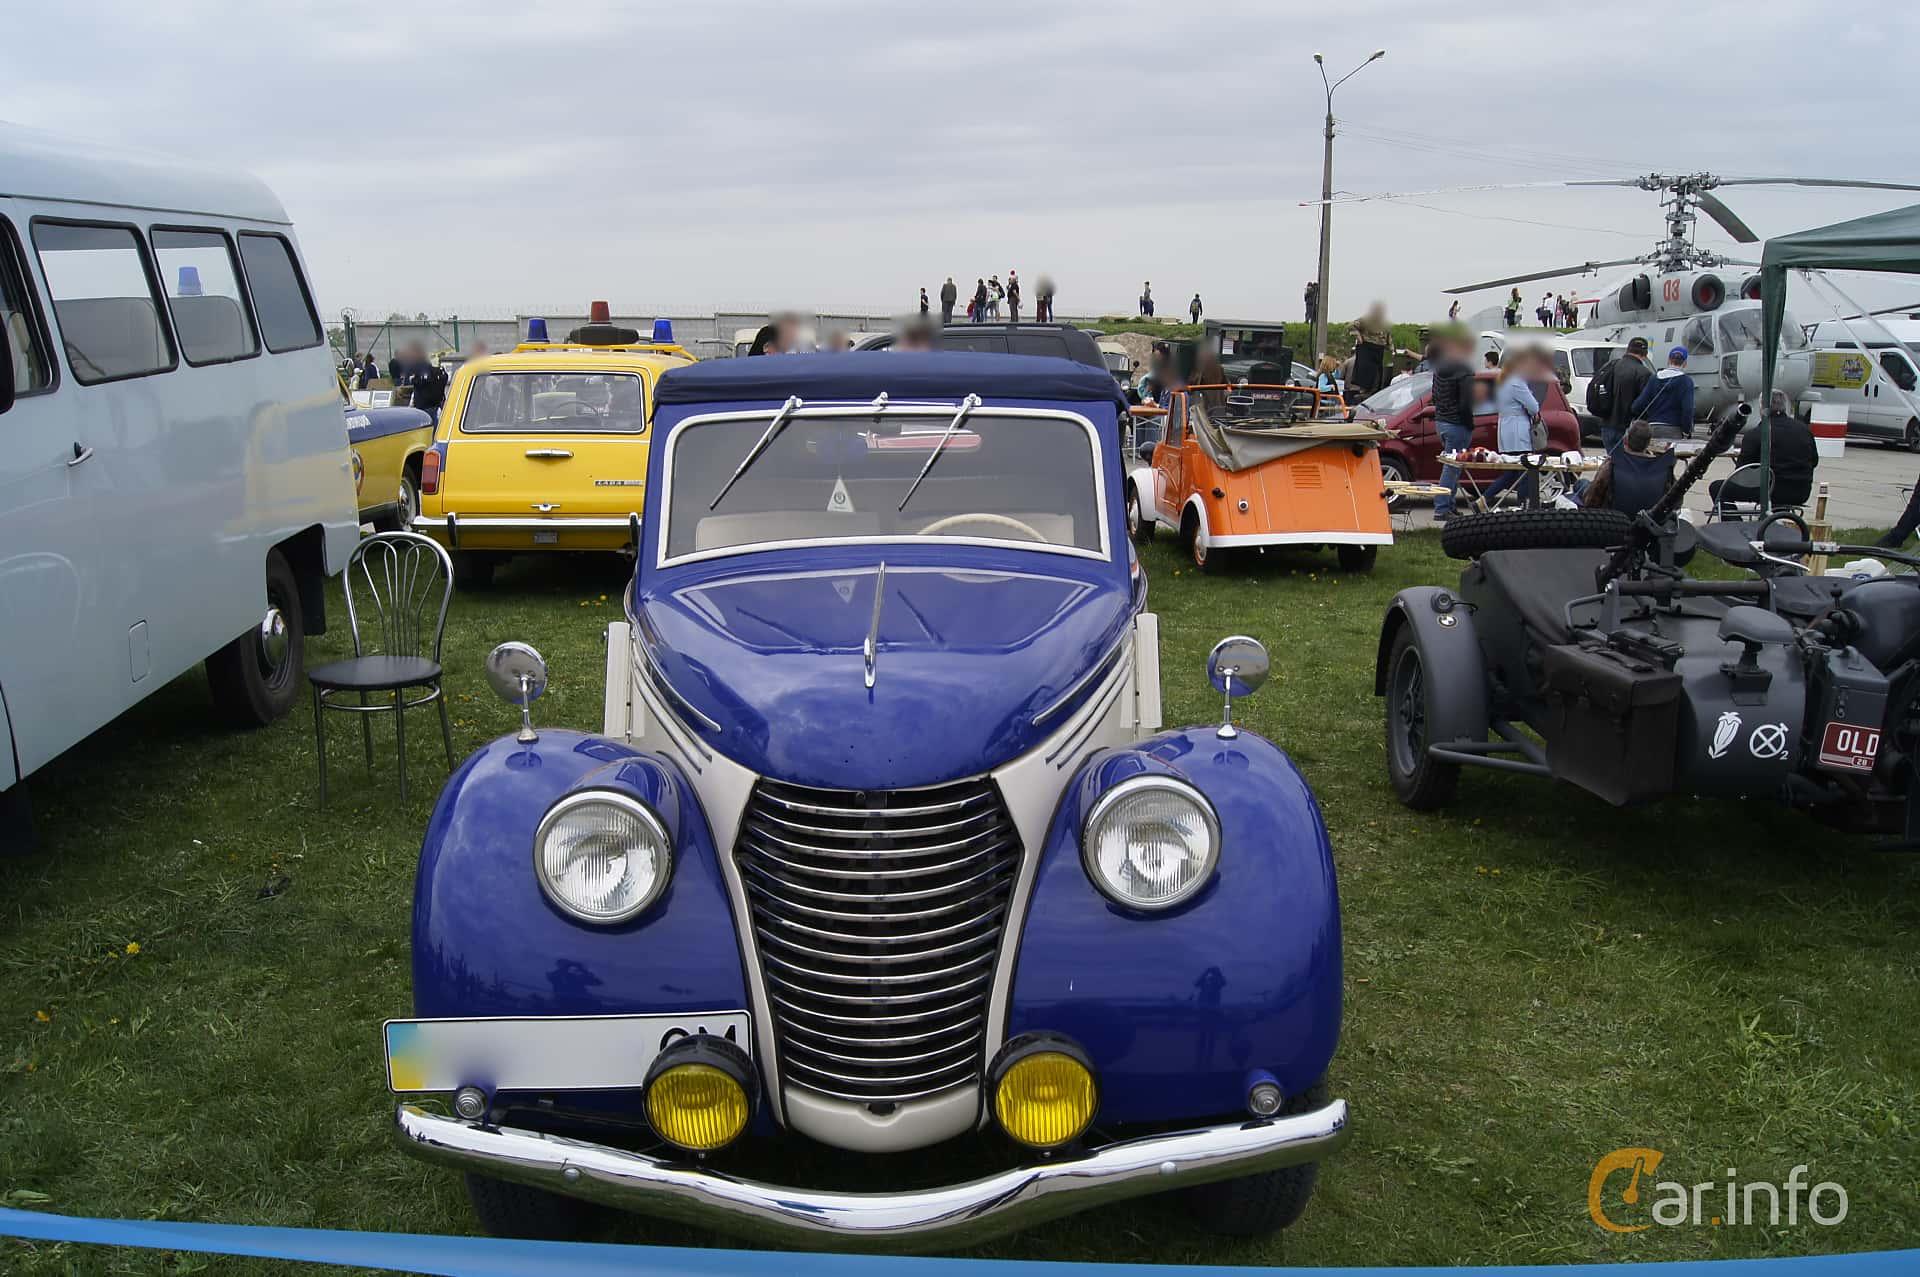 Skoda Popular 1100 OHV Convertible 1.1 Manuell, 30hk, 1939 at Old Car Land no.1 2017